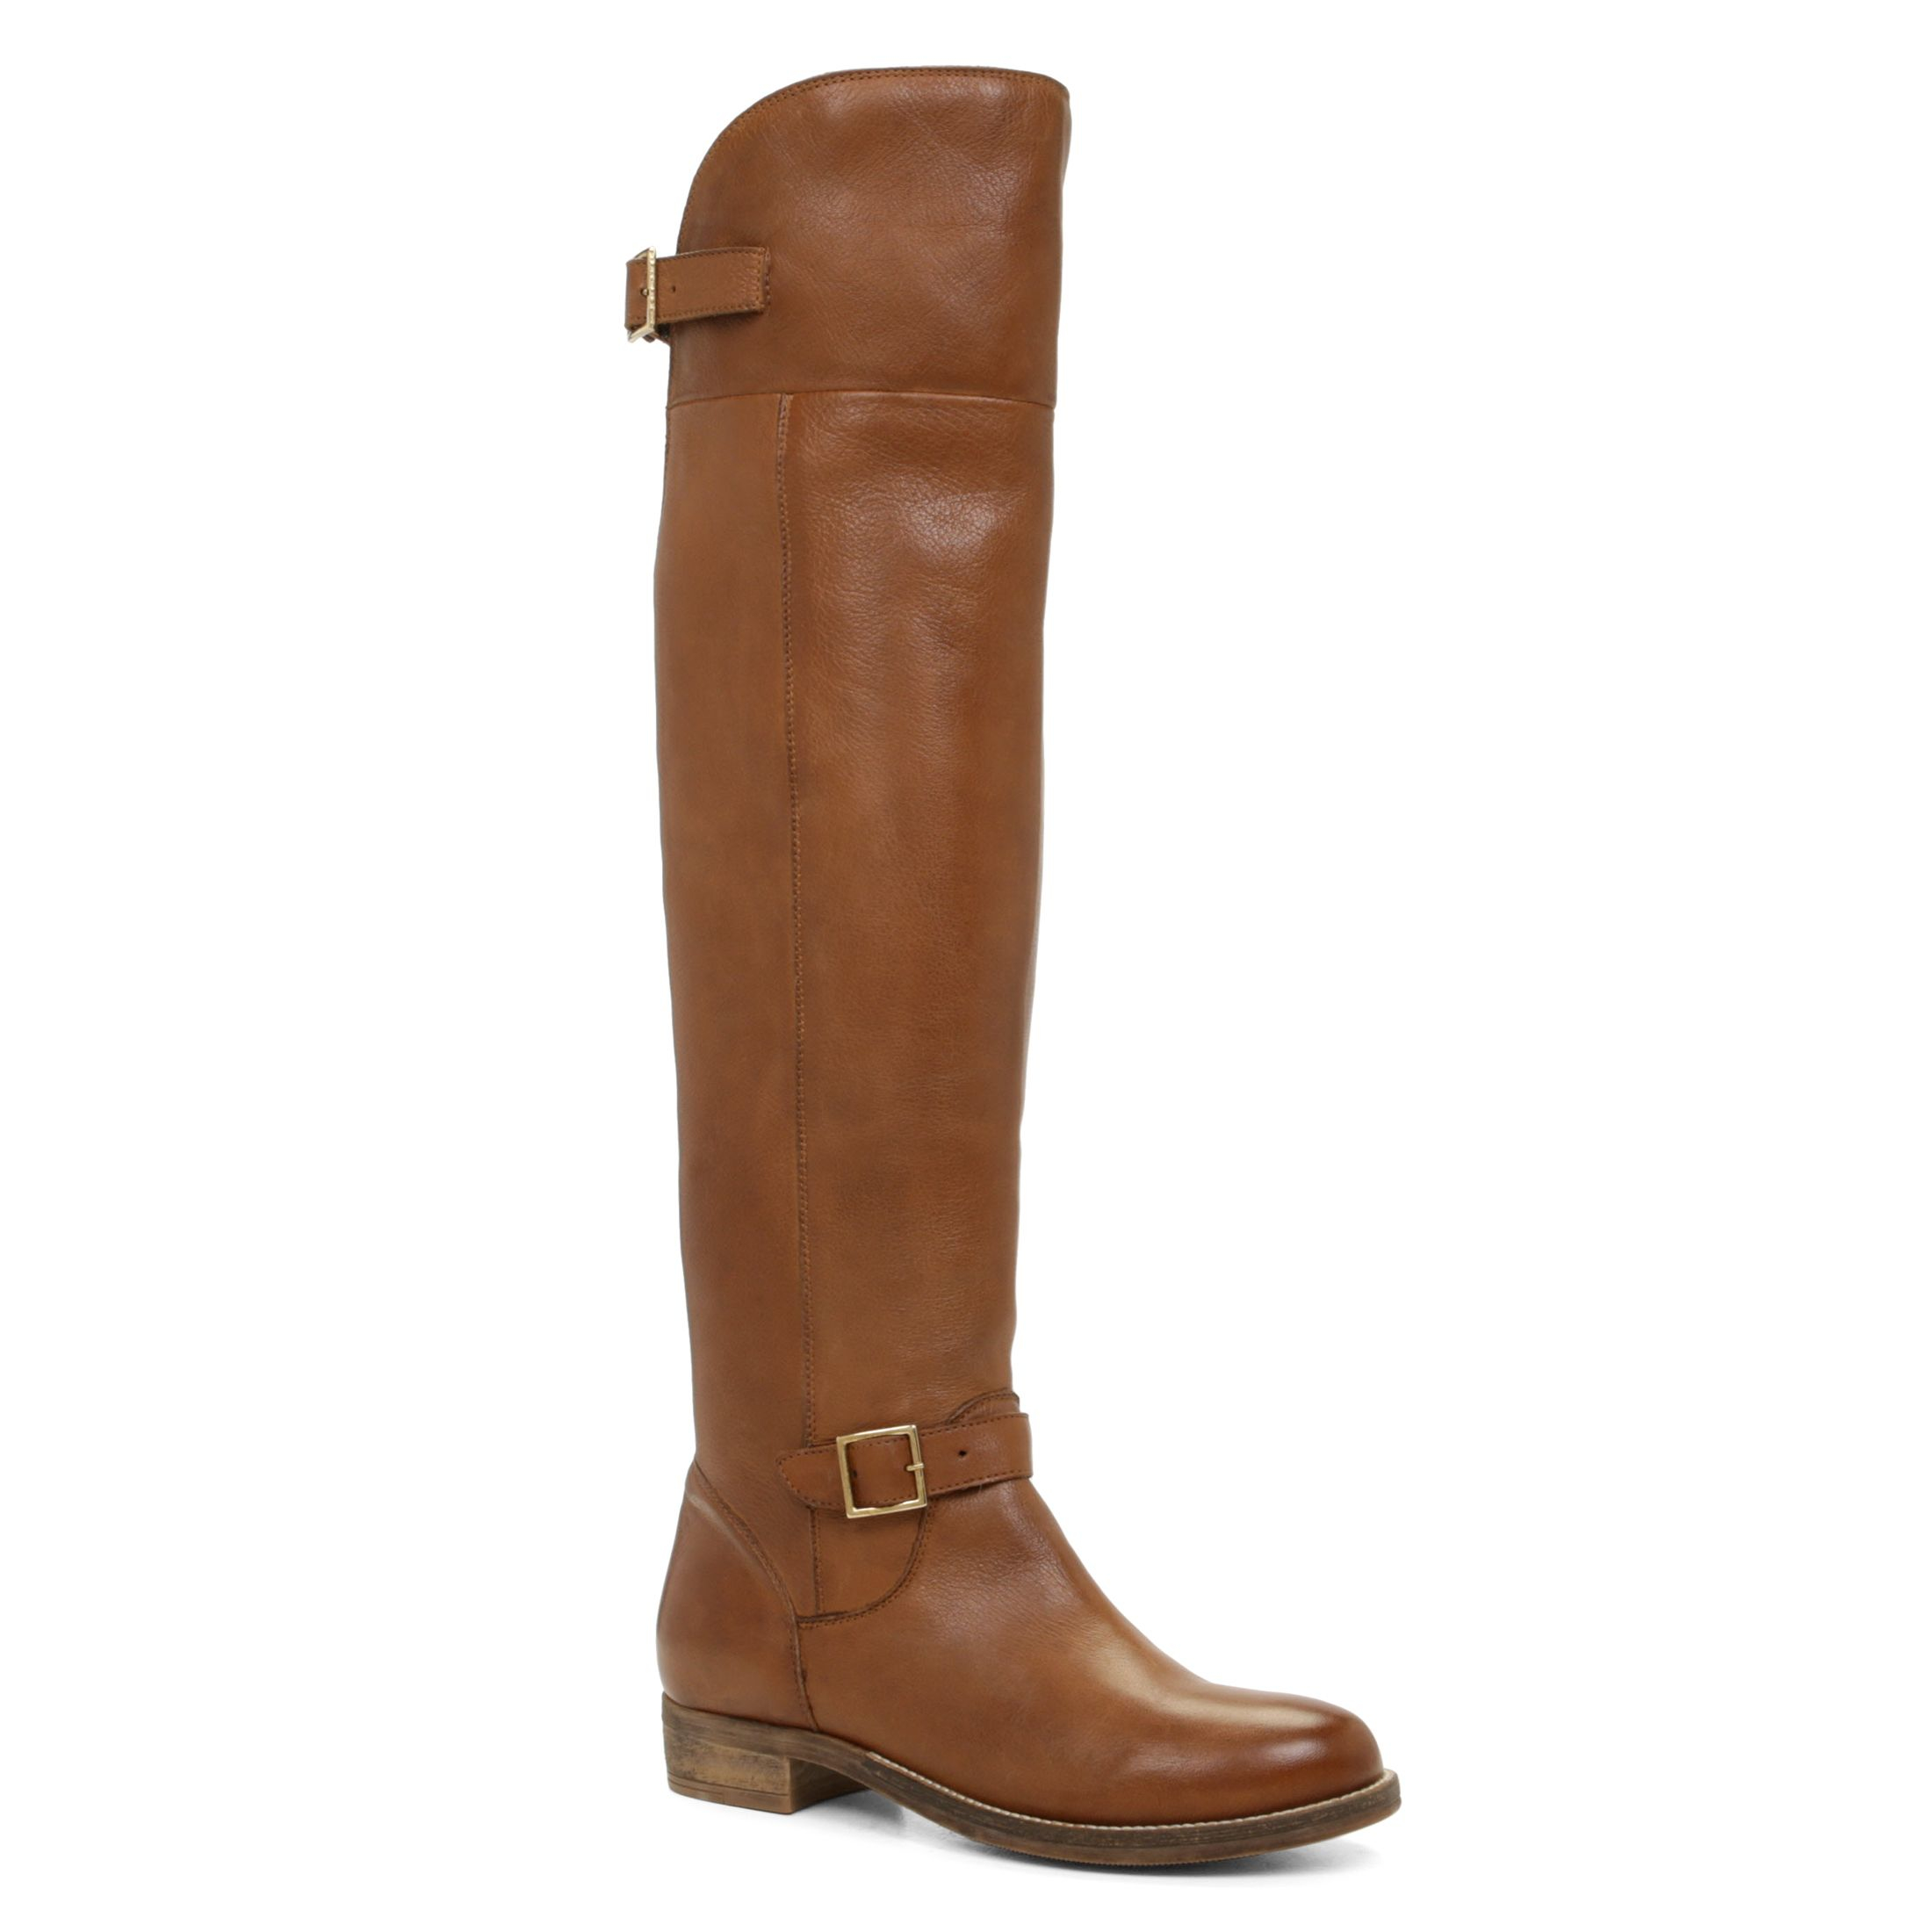 Aldo Gella Flat Over The Knee Boots in Brown | Lyst